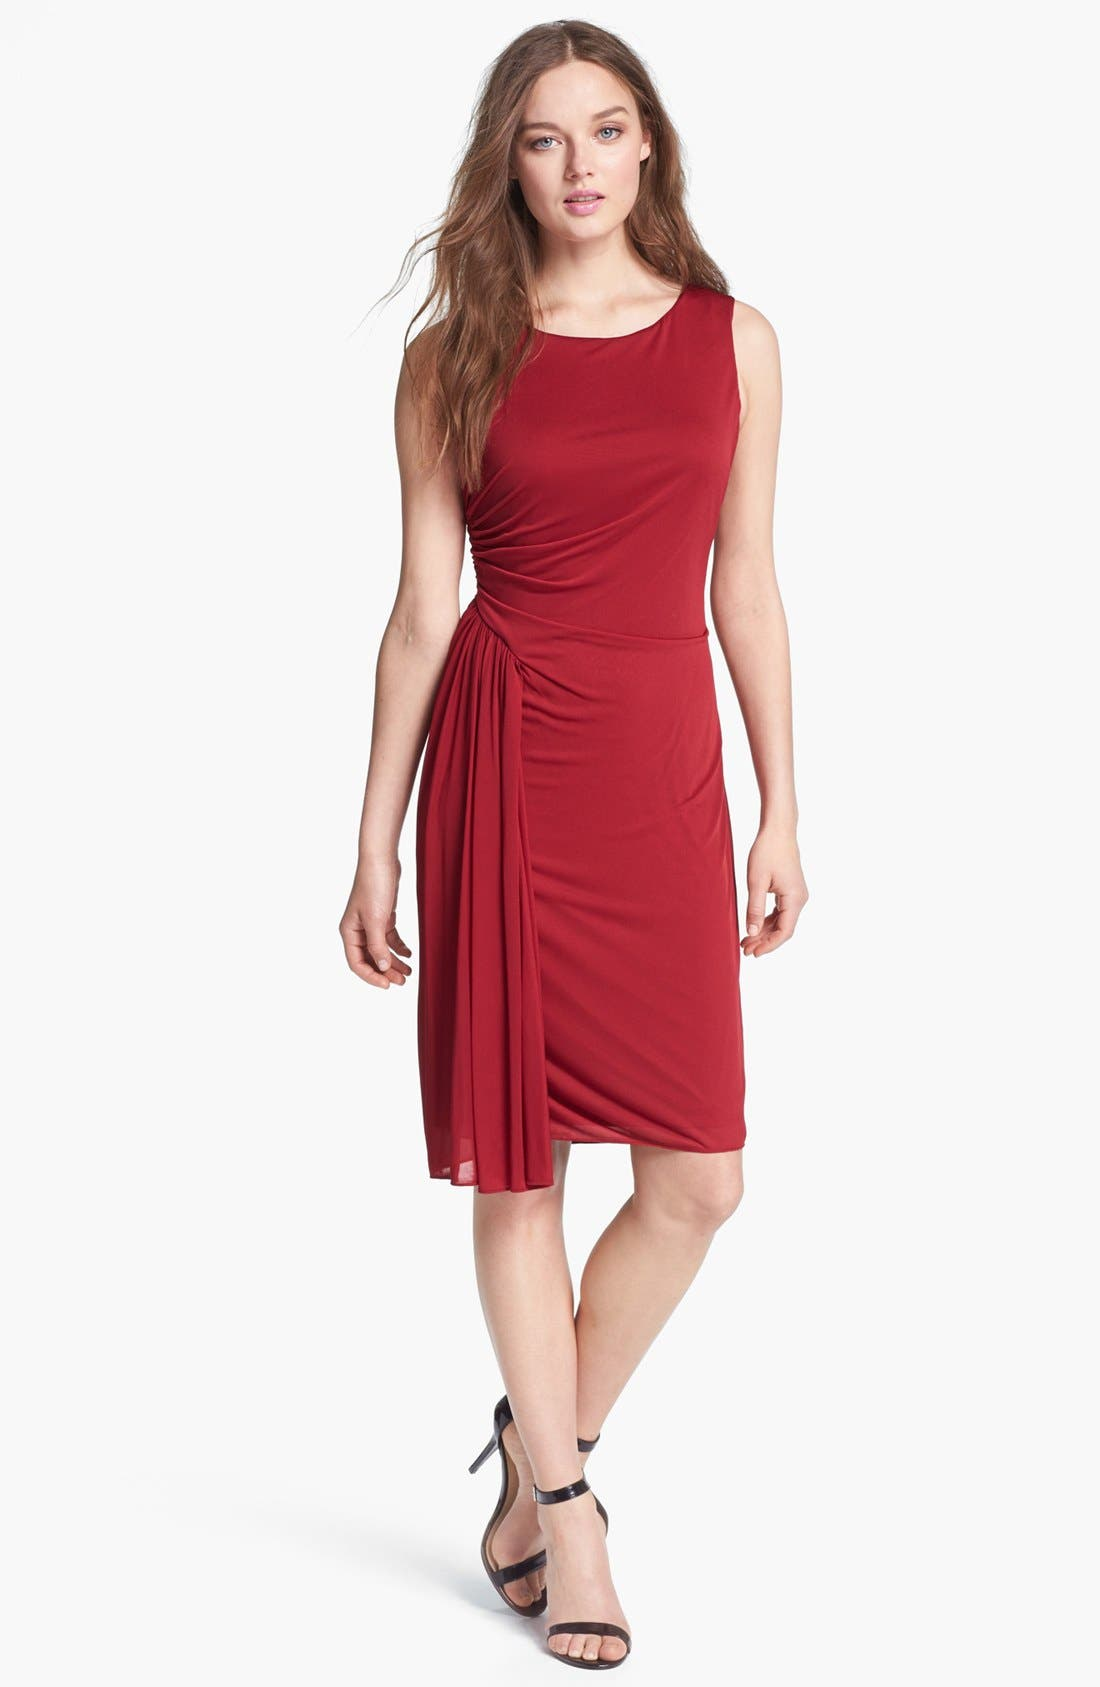 Alternate Image 1 Selected - Adrianna Papell Side Drape Sheath Dress